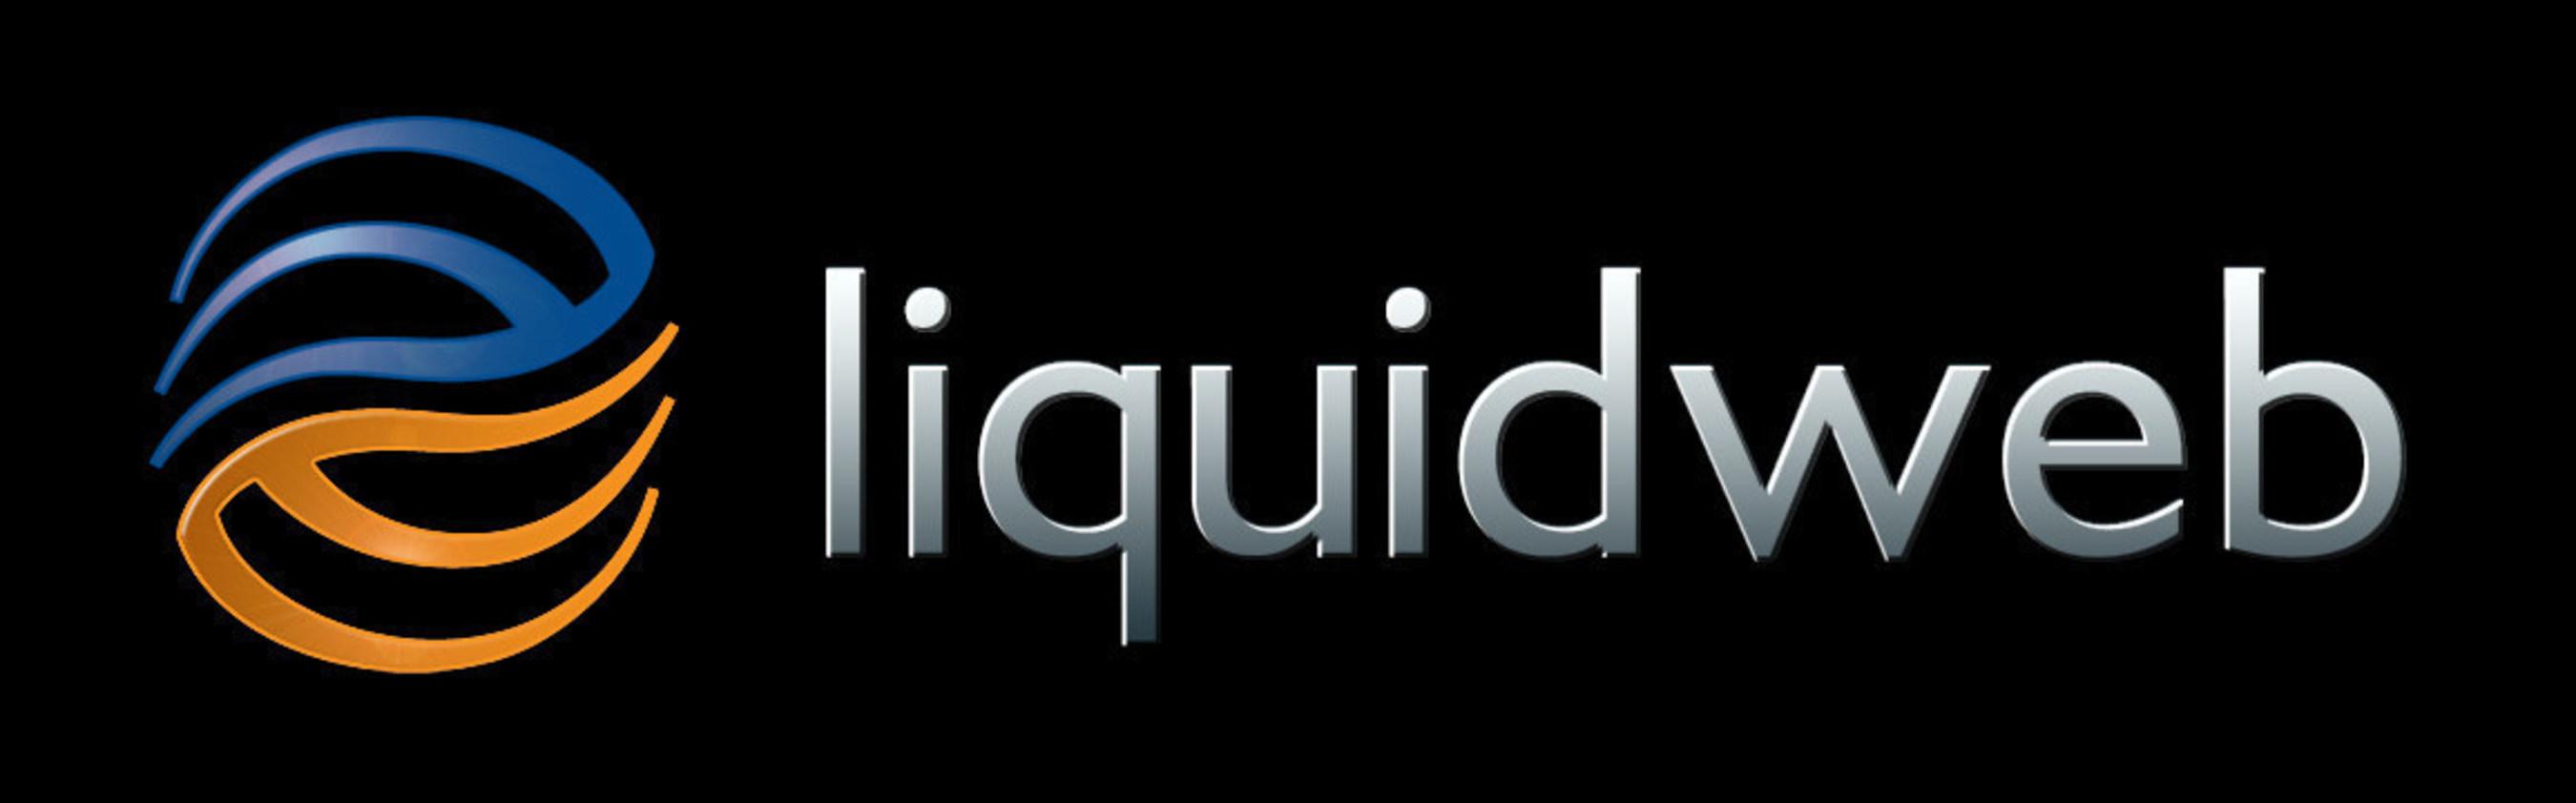 Liquid Web Launches New Managed WordPress Platform